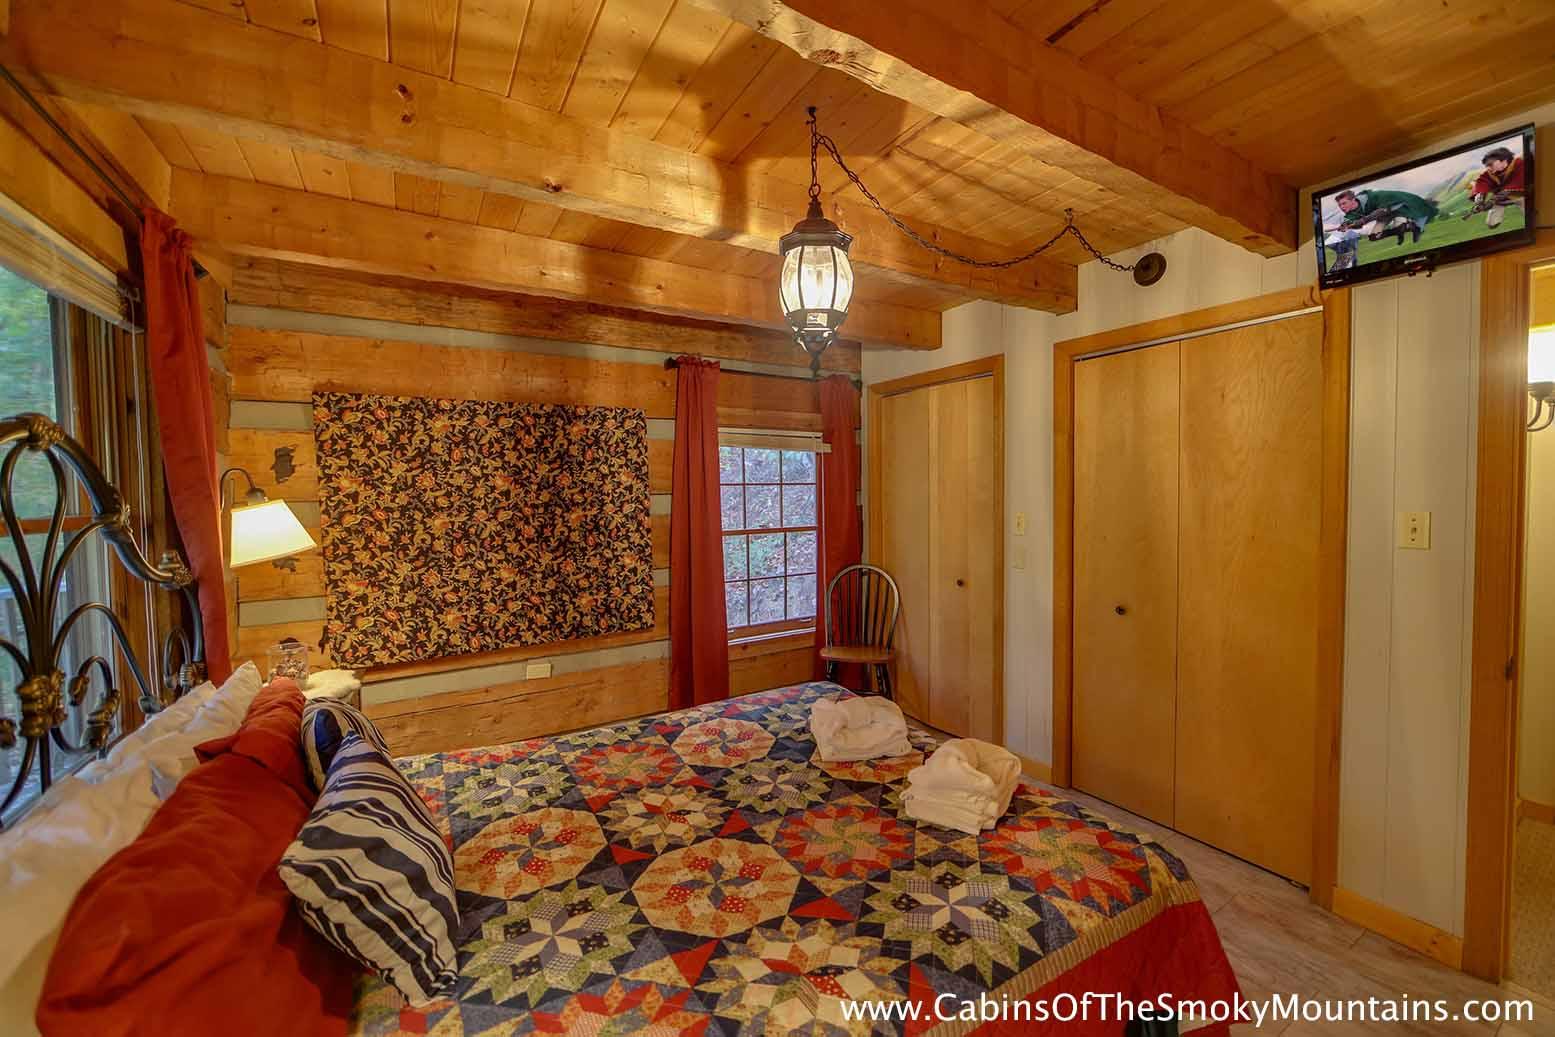 Gatlinburg cabin da 39 mar 3 bedroom sleeps 8 for 3 bedroom cabins in smoky mountains